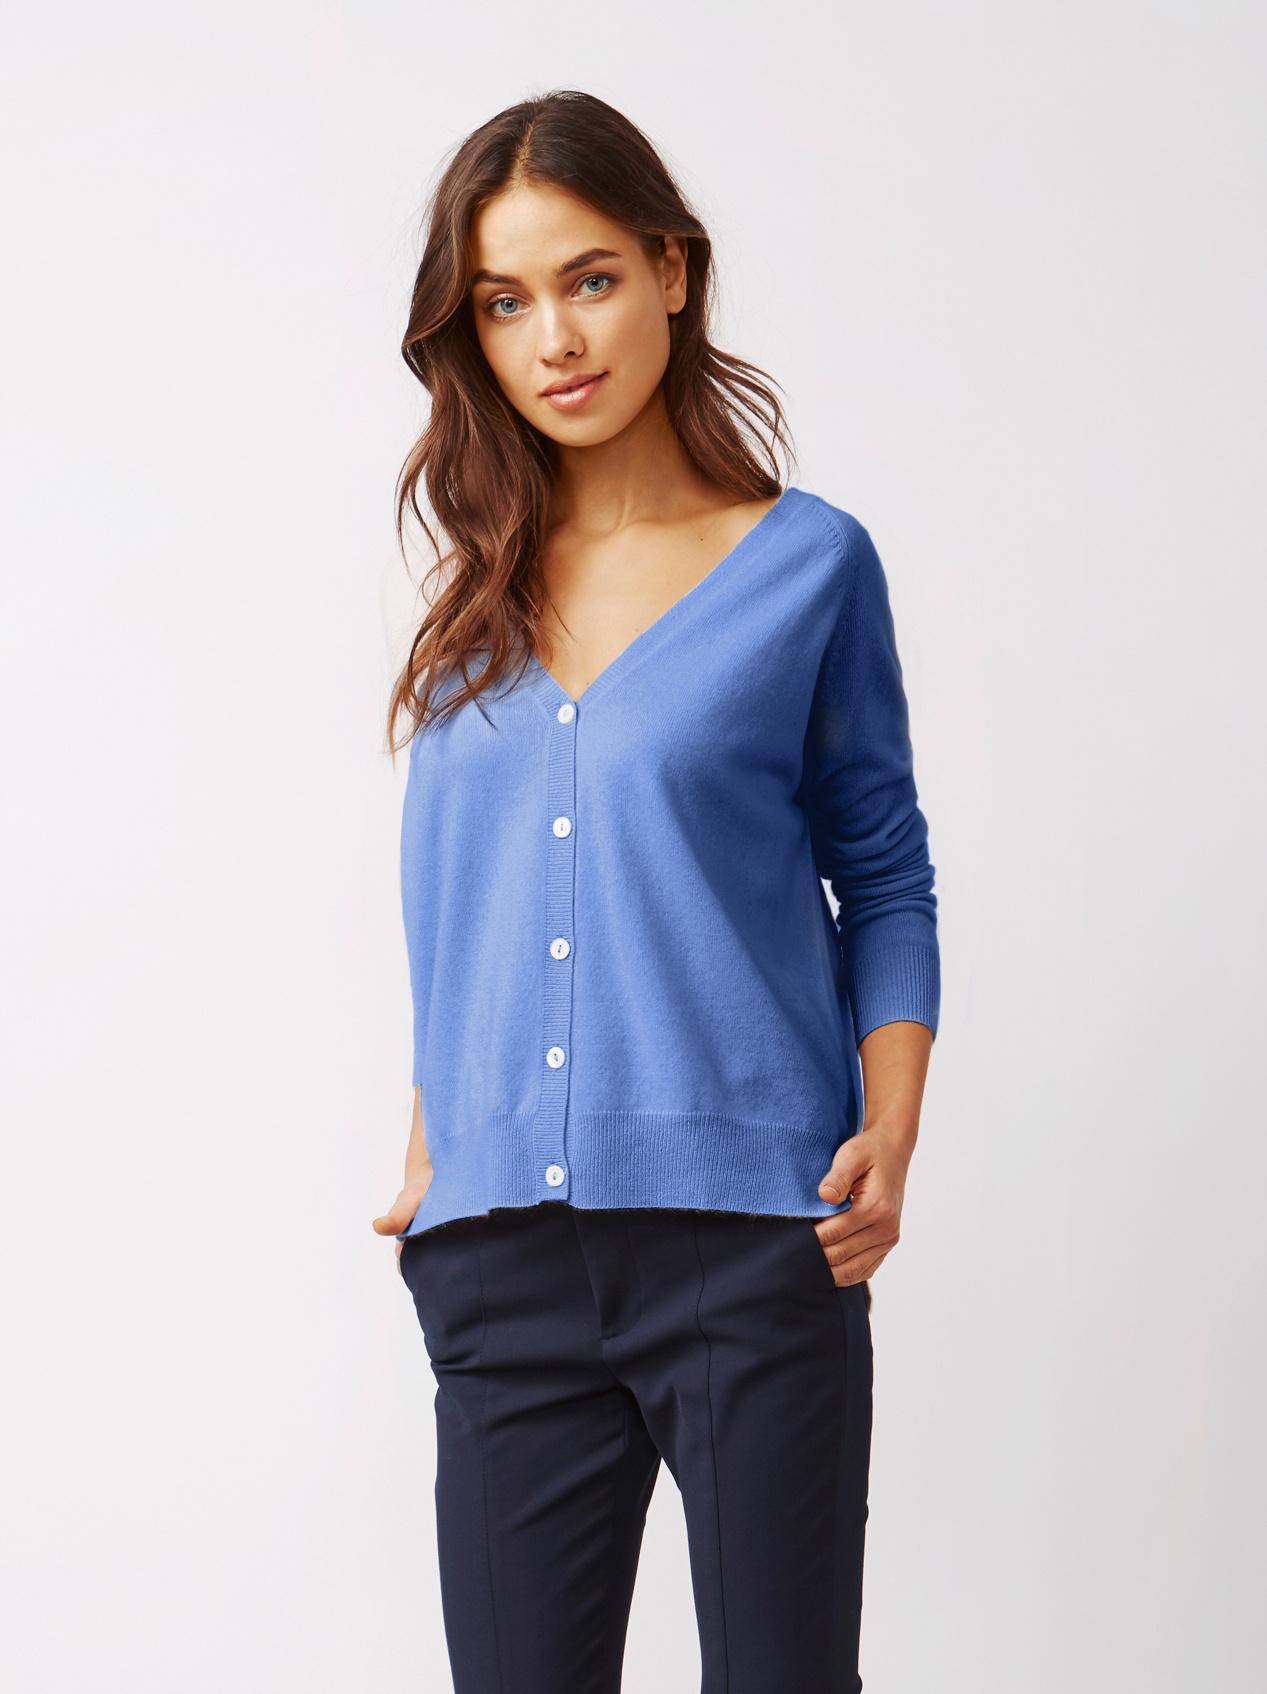 Soft Goat Women's V-Neck Cardigan Sky Blue